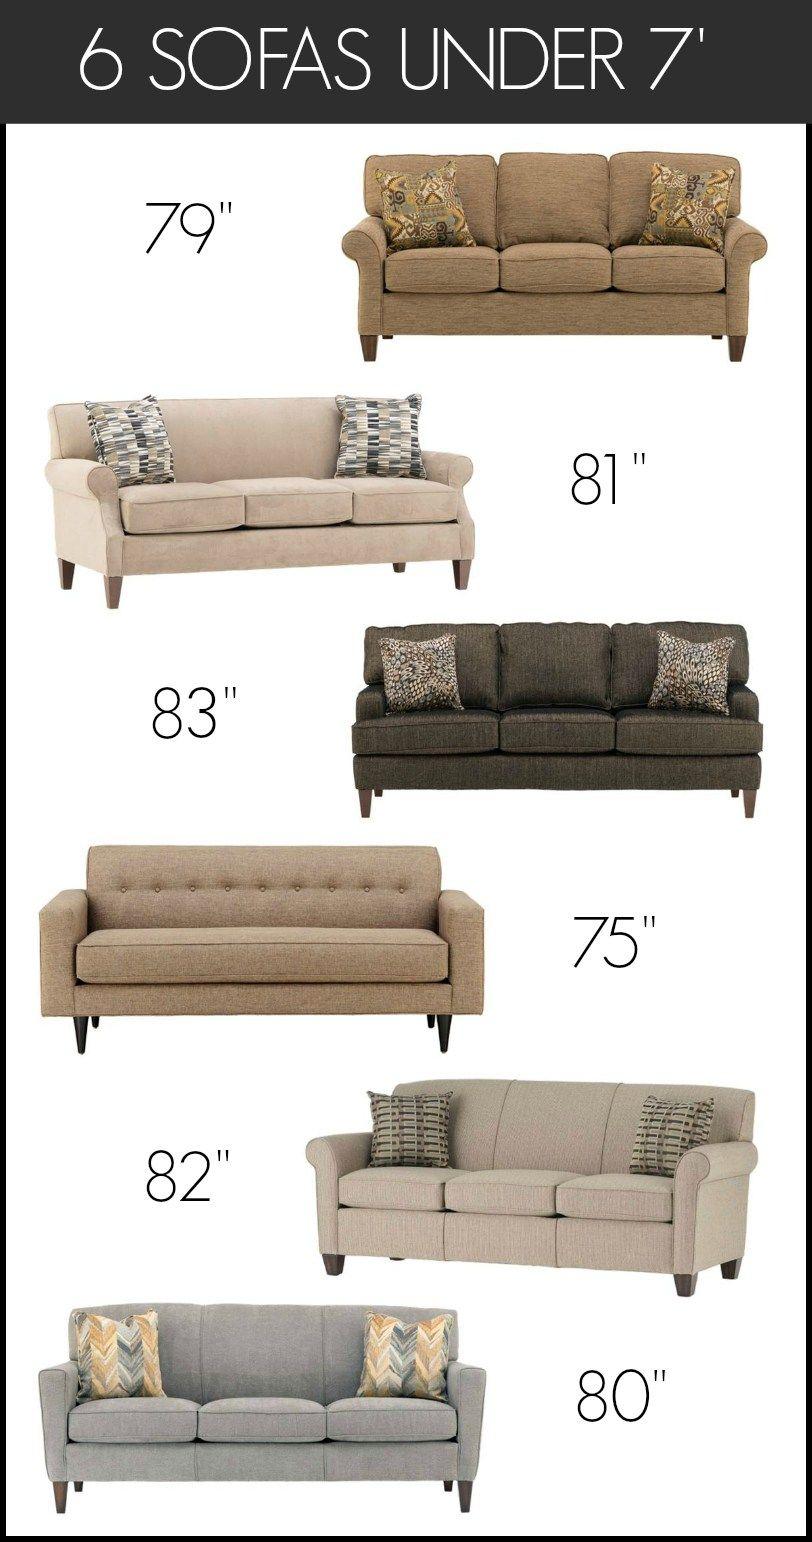 furnishing small spaces 6 sofas under 7 feet living rooms ideas rh pinterest com